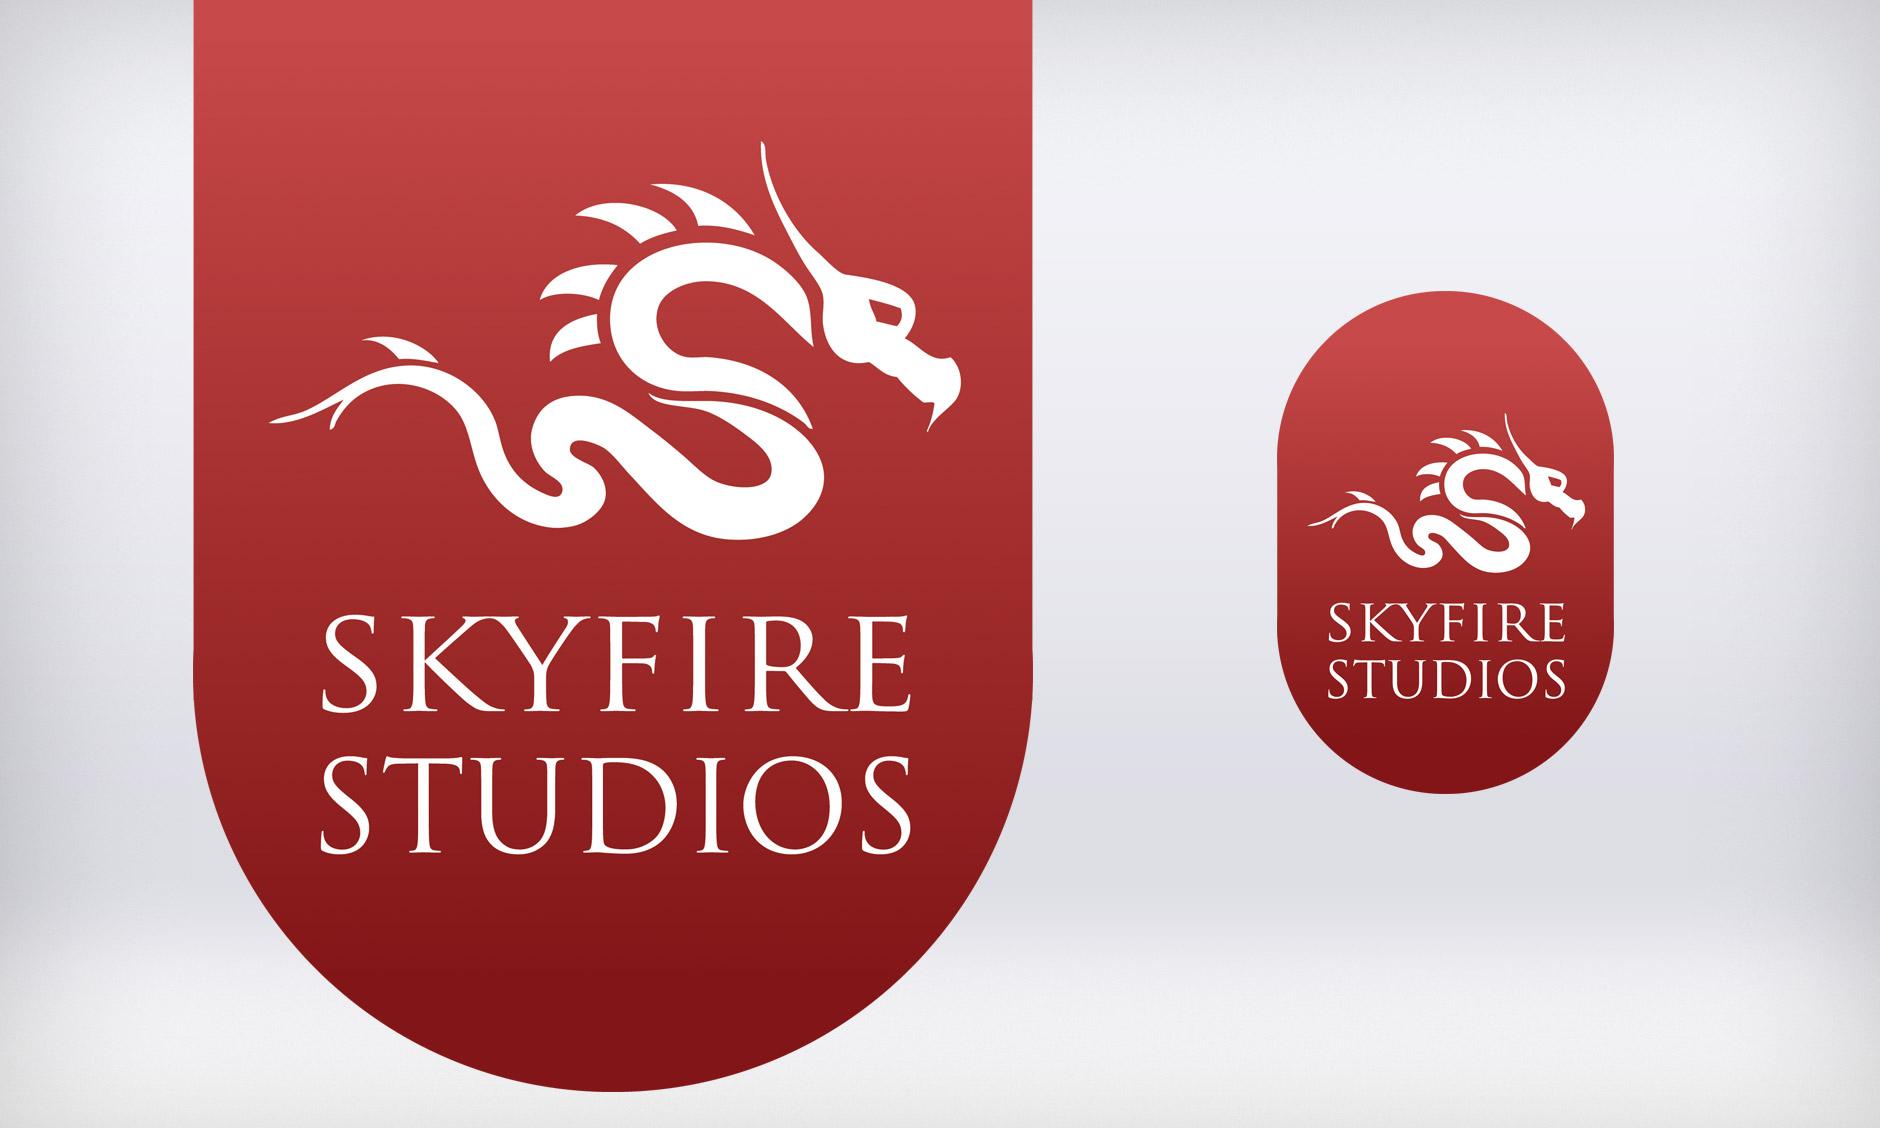 Skyfire Studios